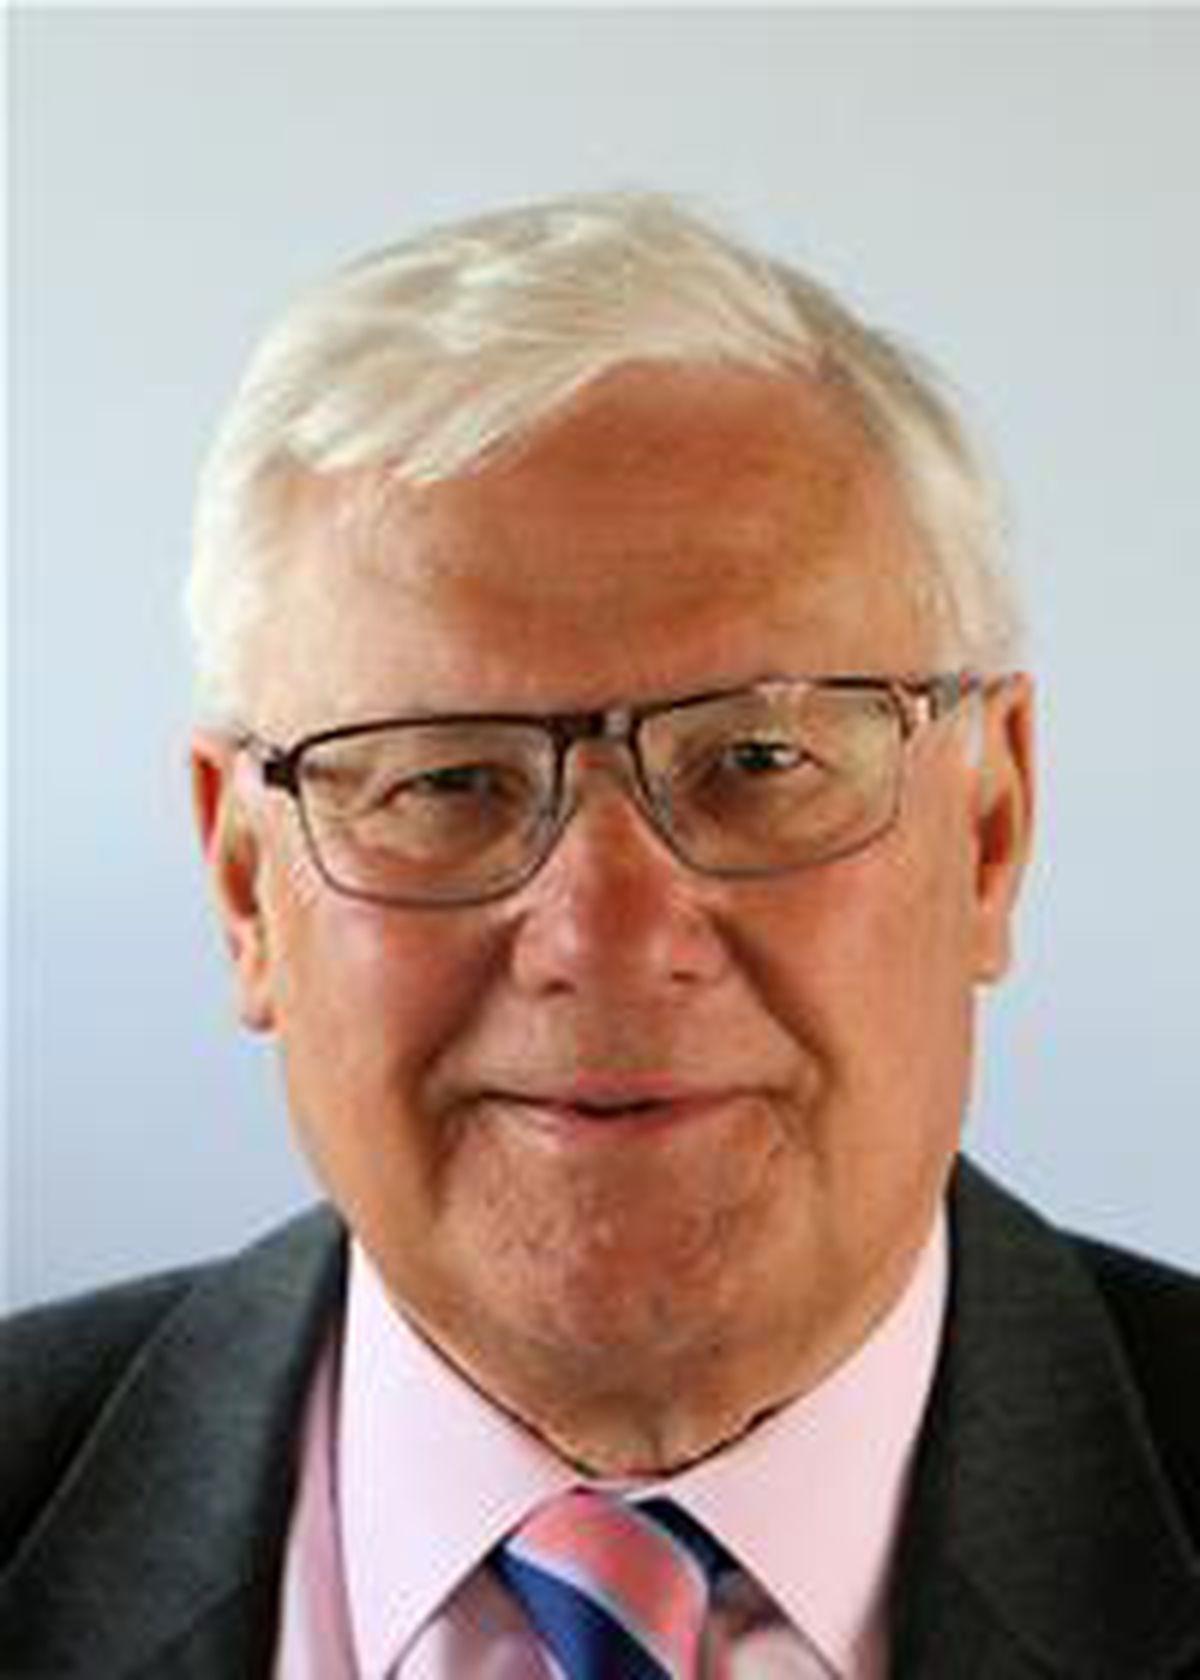 Councillor Gareth Morgan